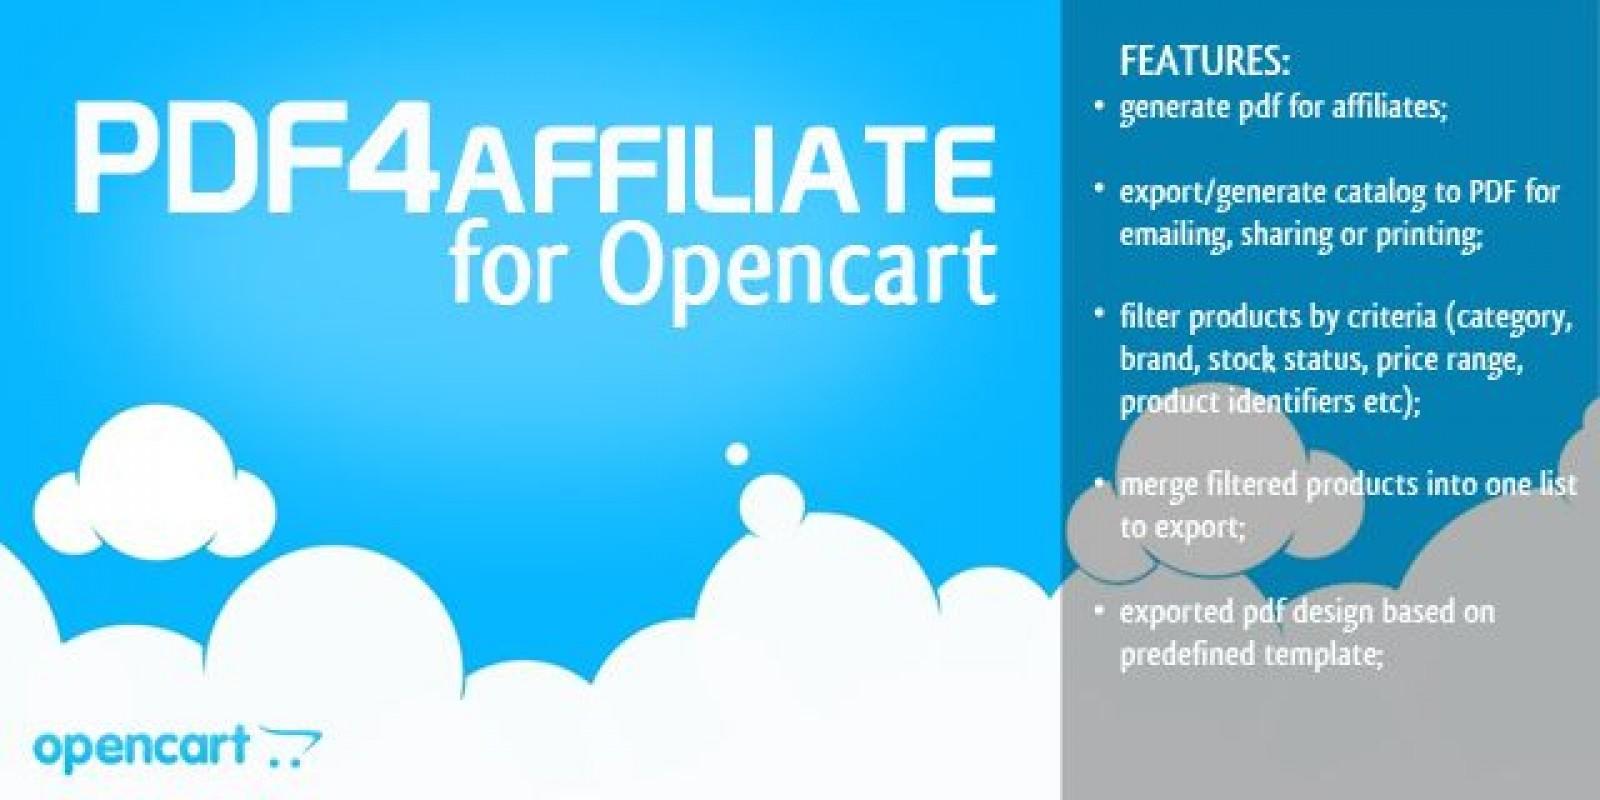 Pdf4Affiliate - Opencart Extension